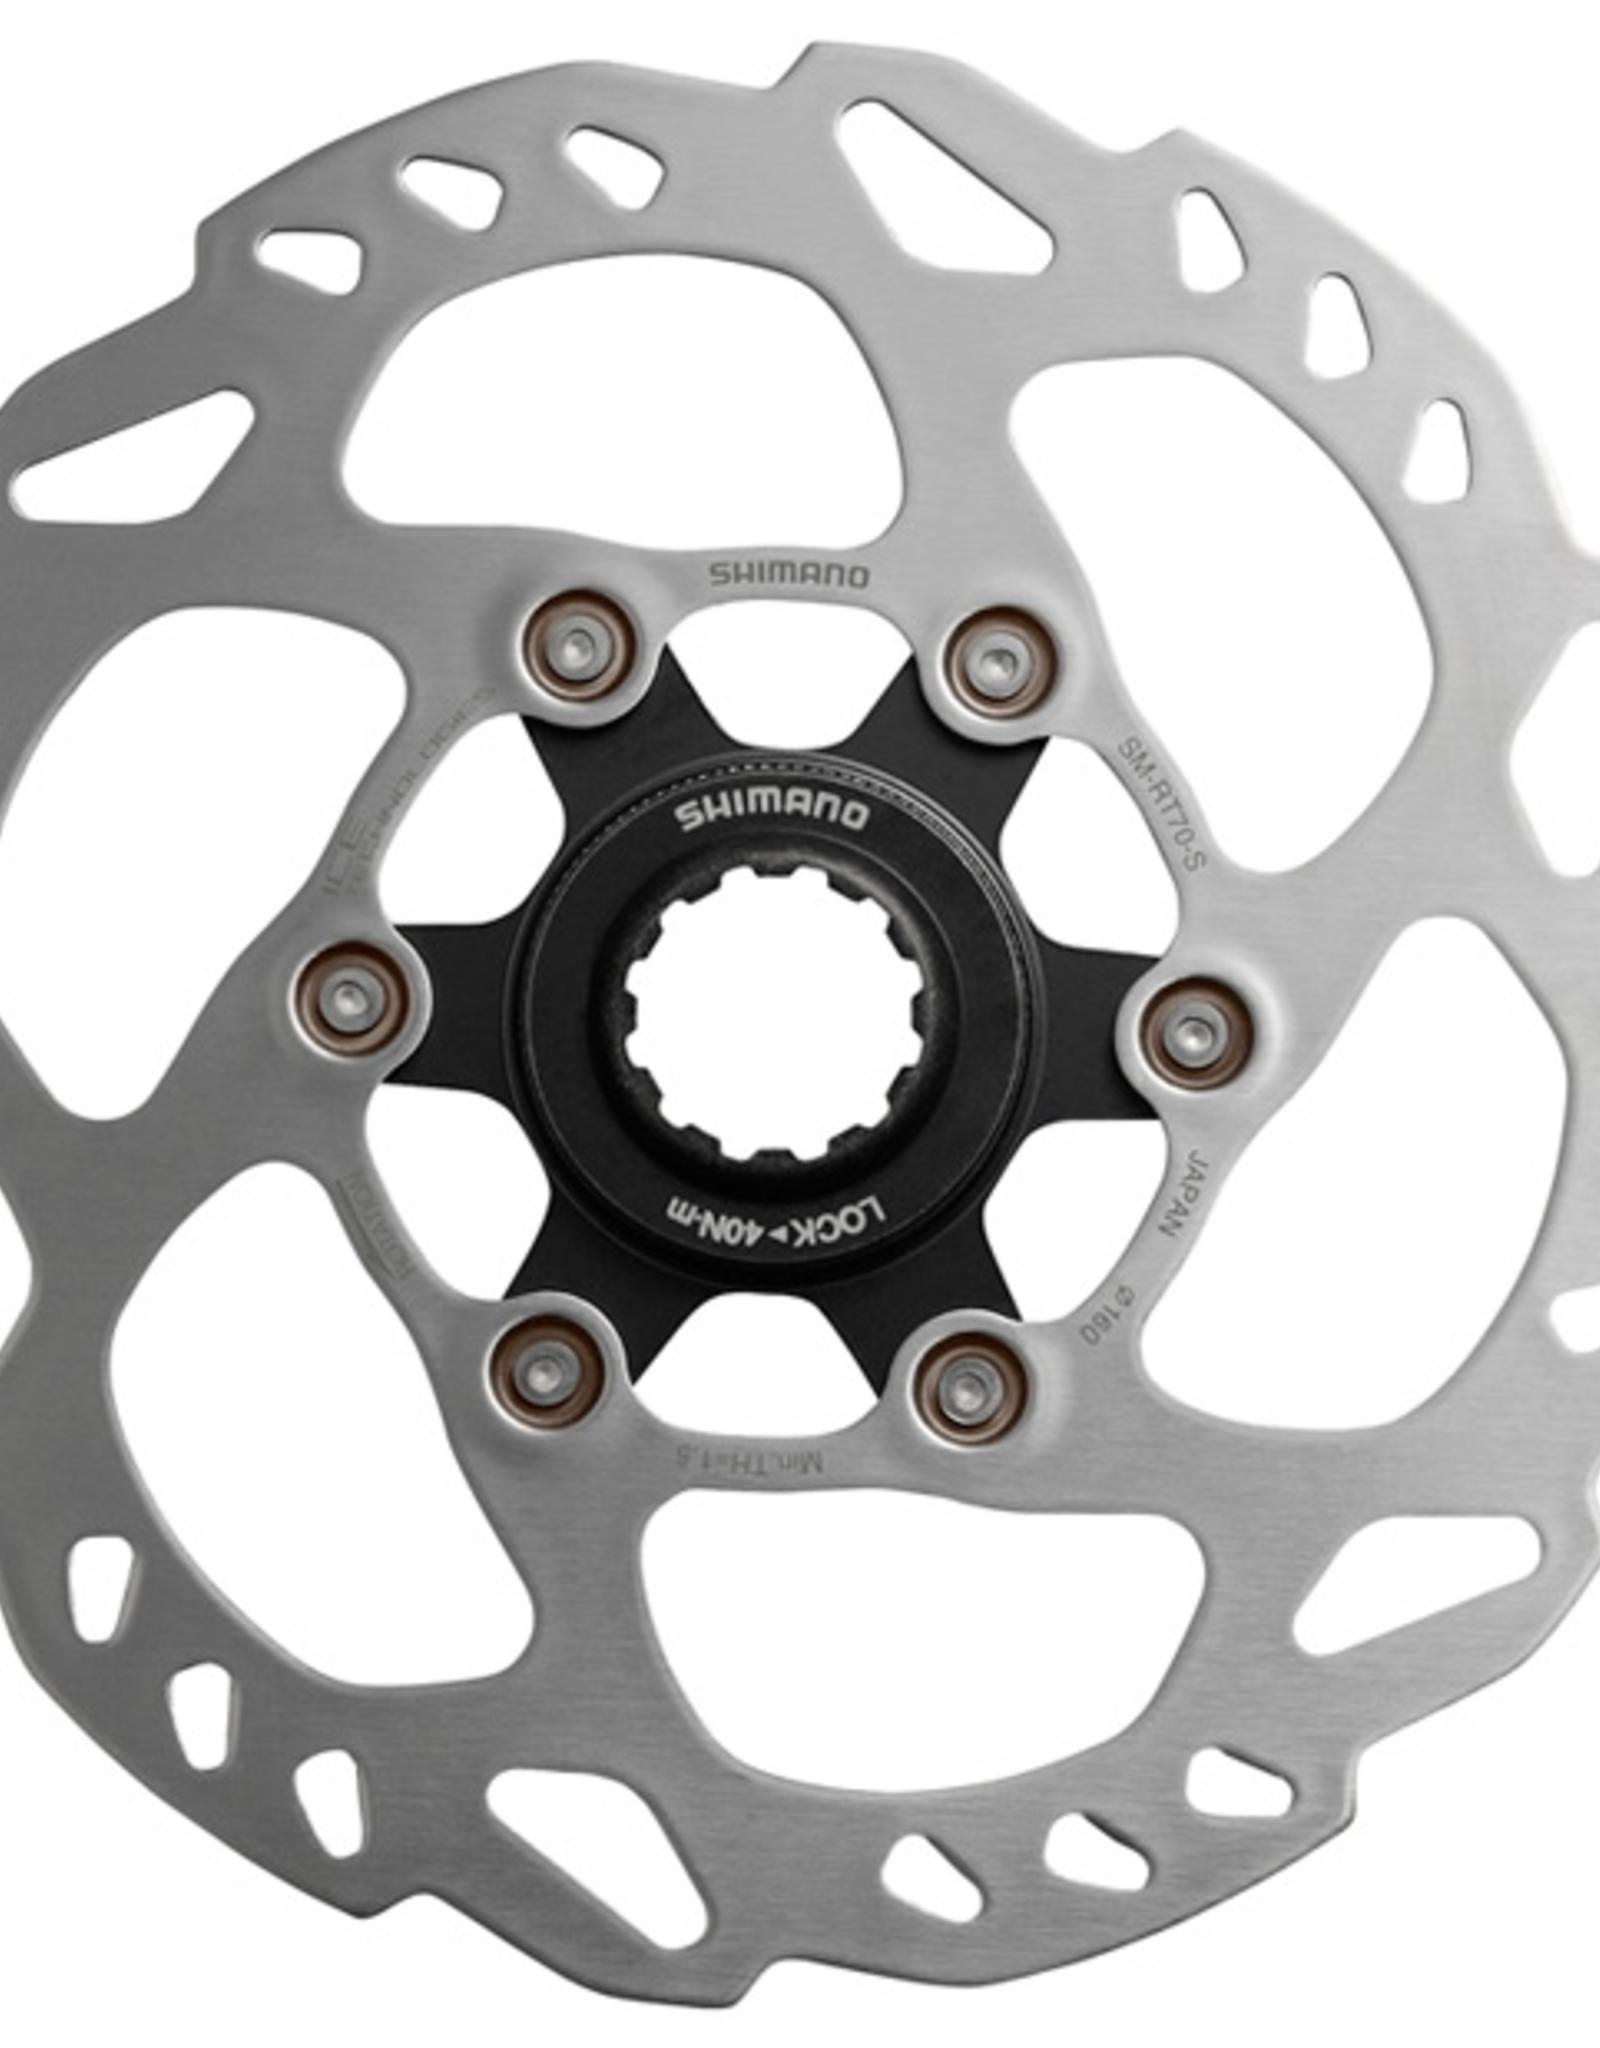 Shimano Shimano RT70 Ice Tech Centre-Lock disc rotor, 160 mm